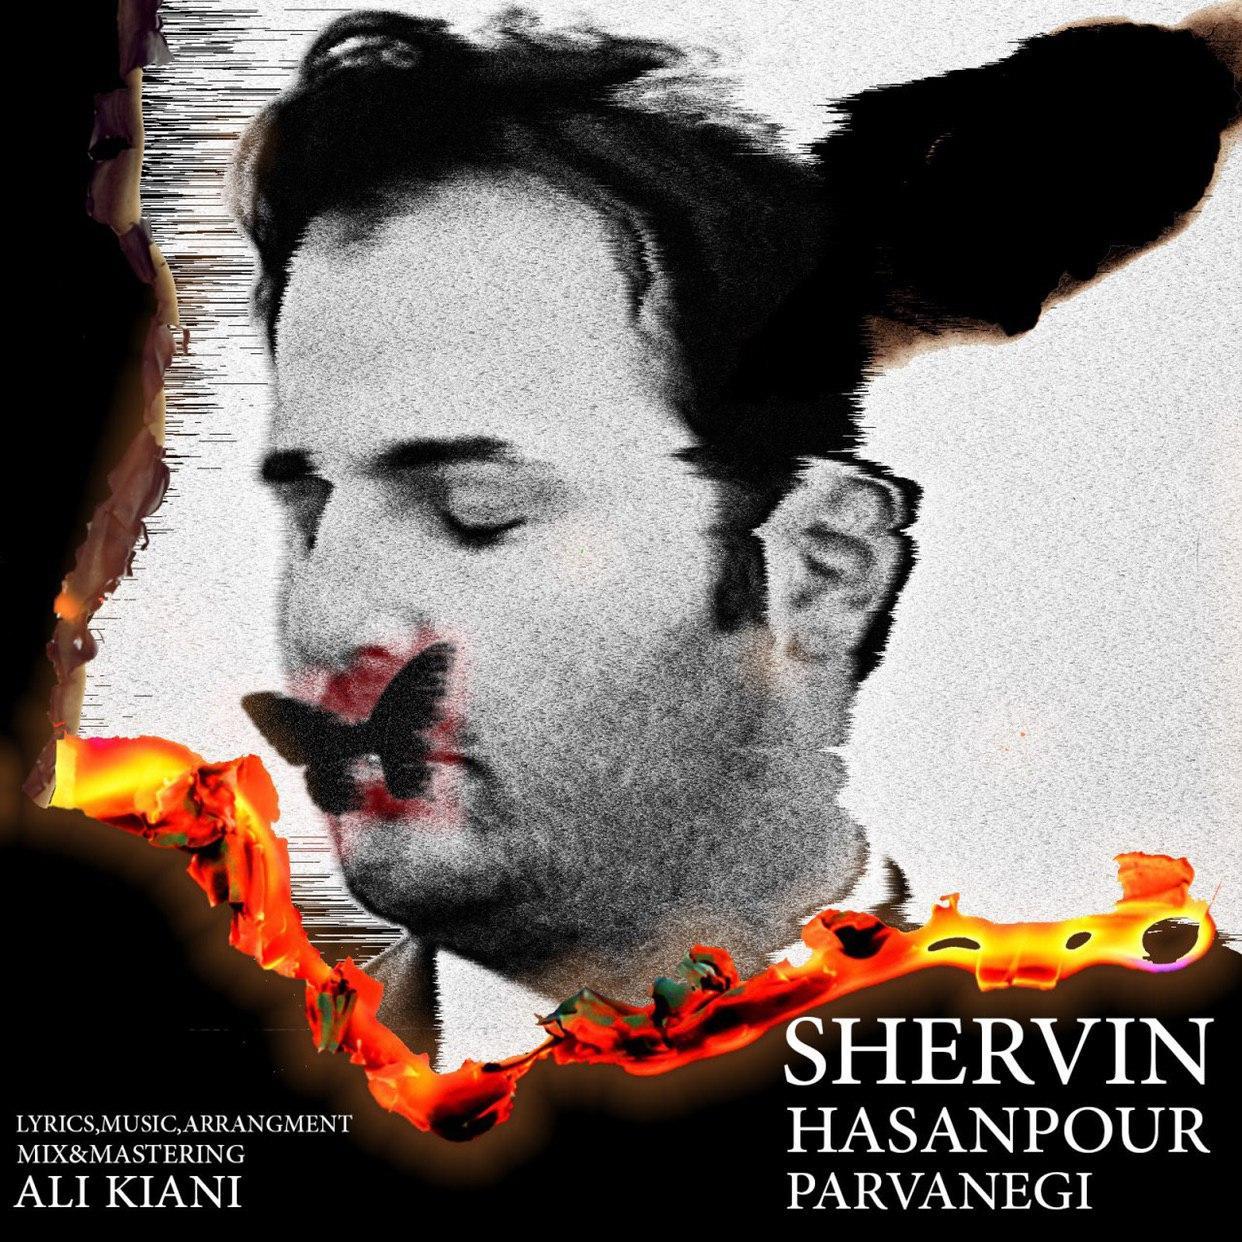 Shervin - Parvanegi - دانلود آهنگ شروین به نام پروانگی